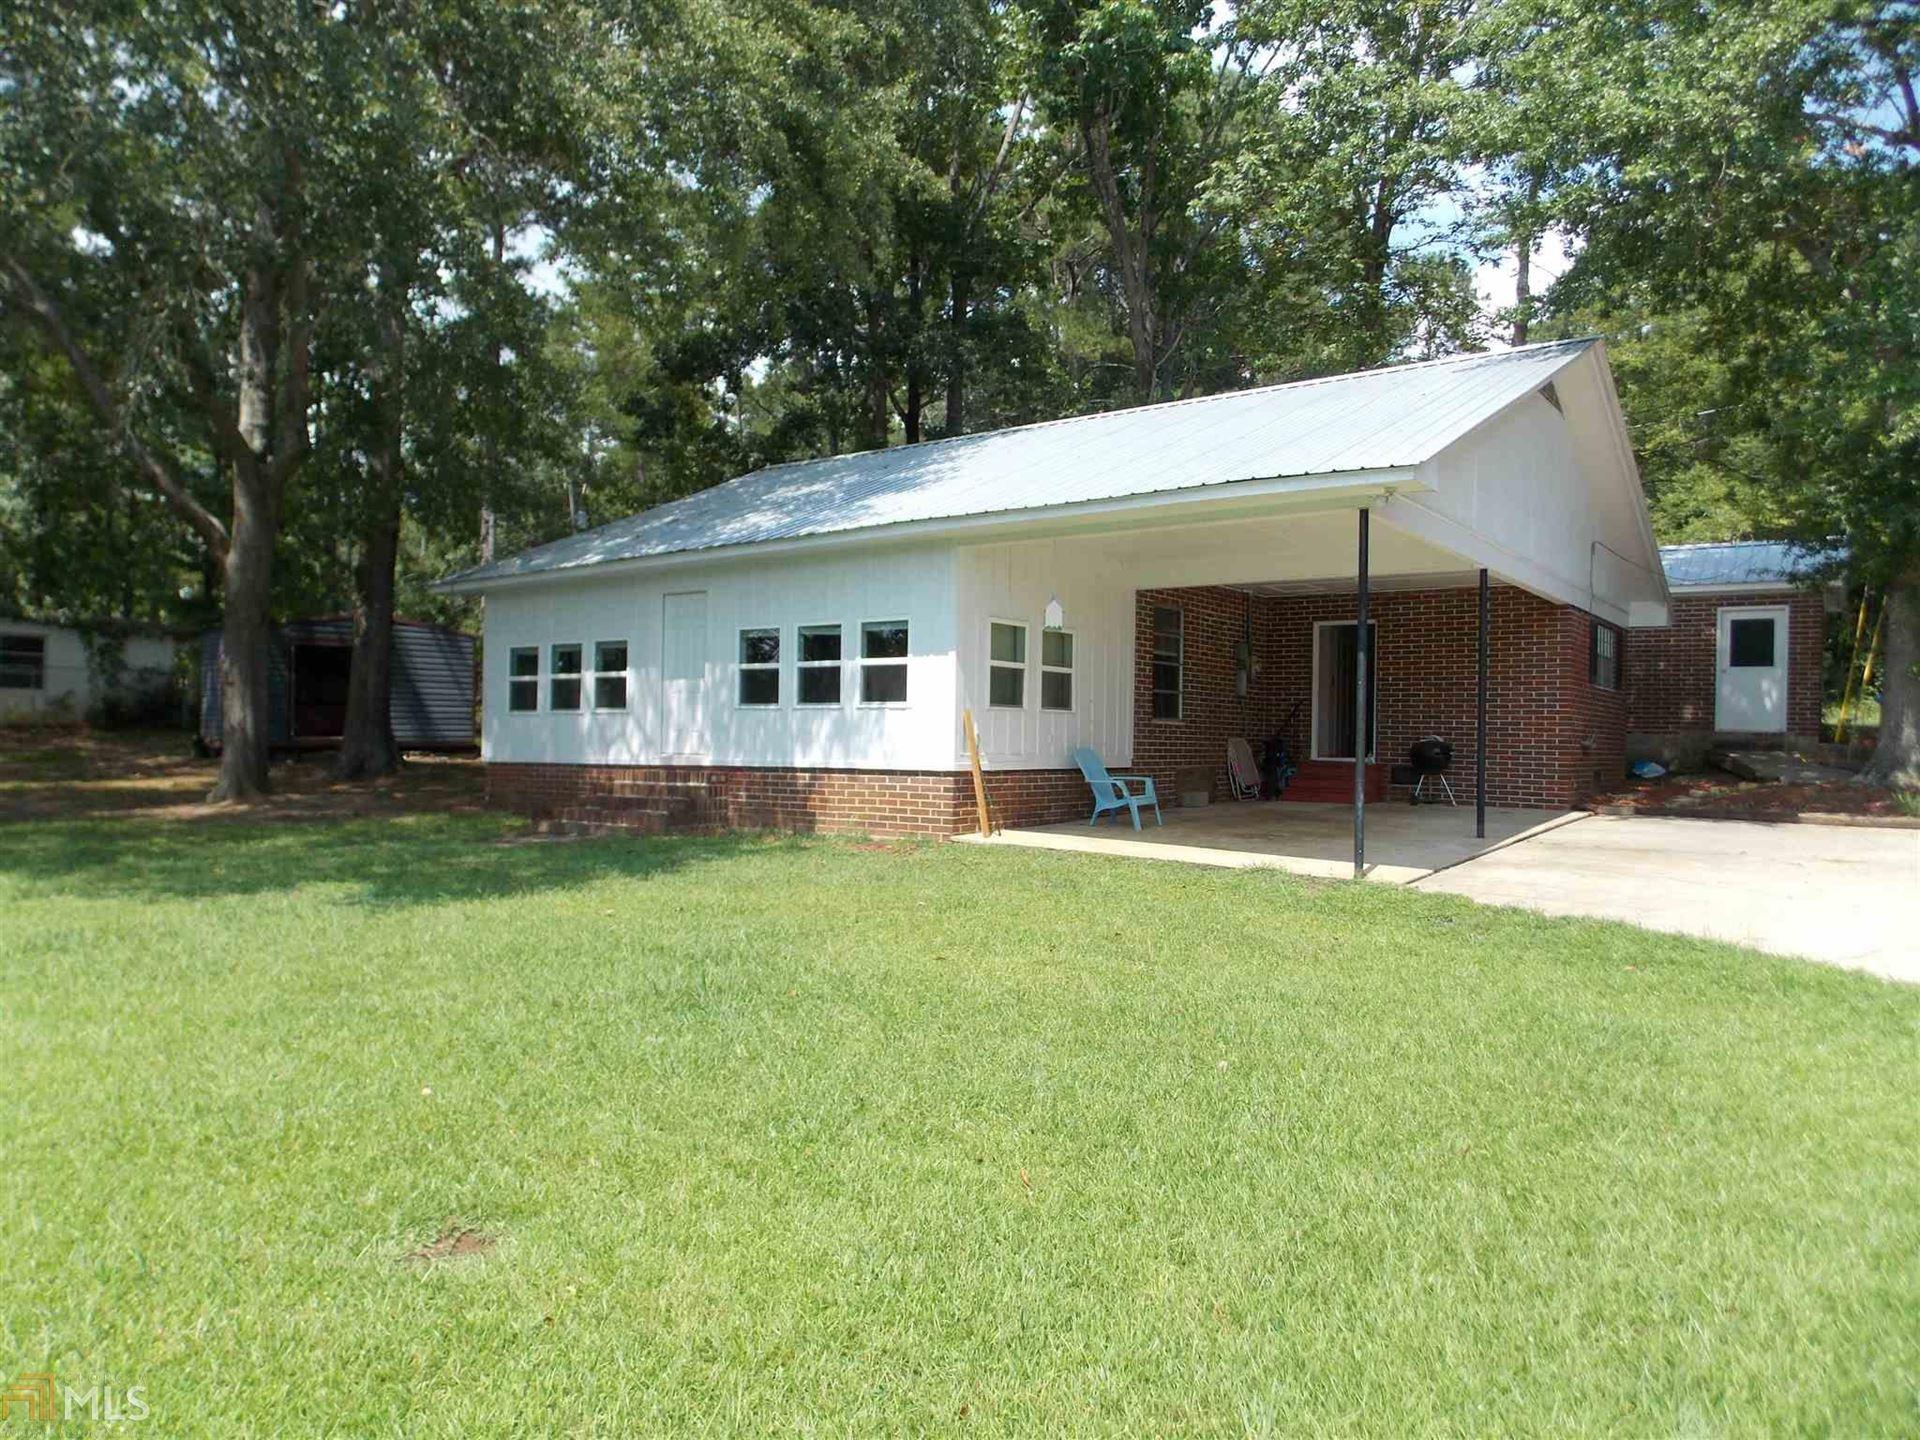 217 S Spring Rd, Eatonton, GA 31024 - MLS#: 8841713